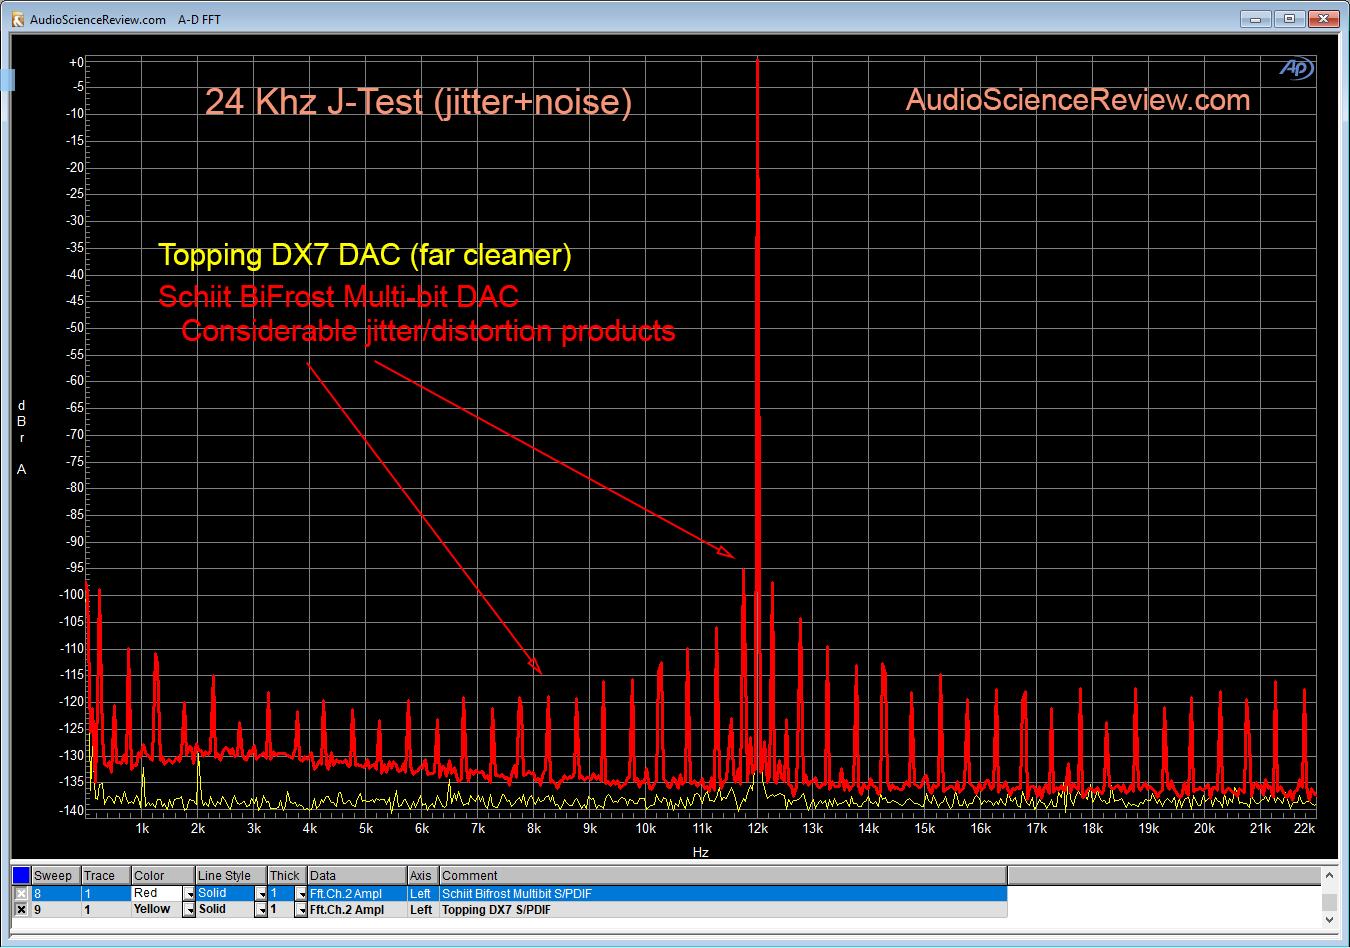 Schiit BiFrost Multibit DAC J-test Jitter Measurement.png